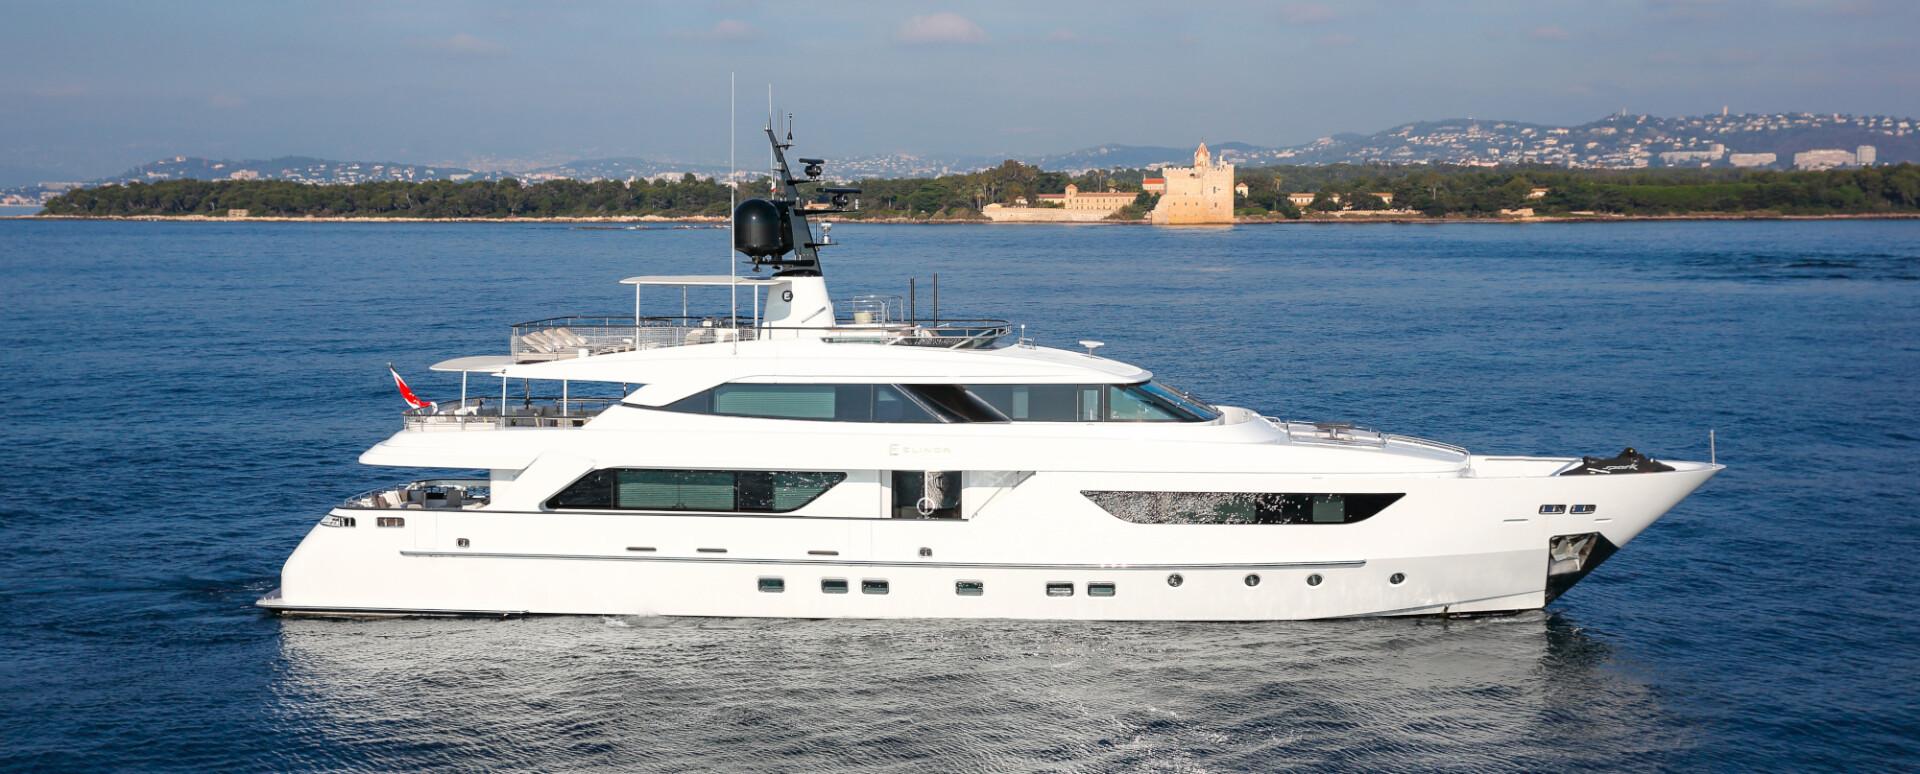 KK Superyachts announces the successful sale of 37m Sanlorenzo SD122' M/Y ELINOR.